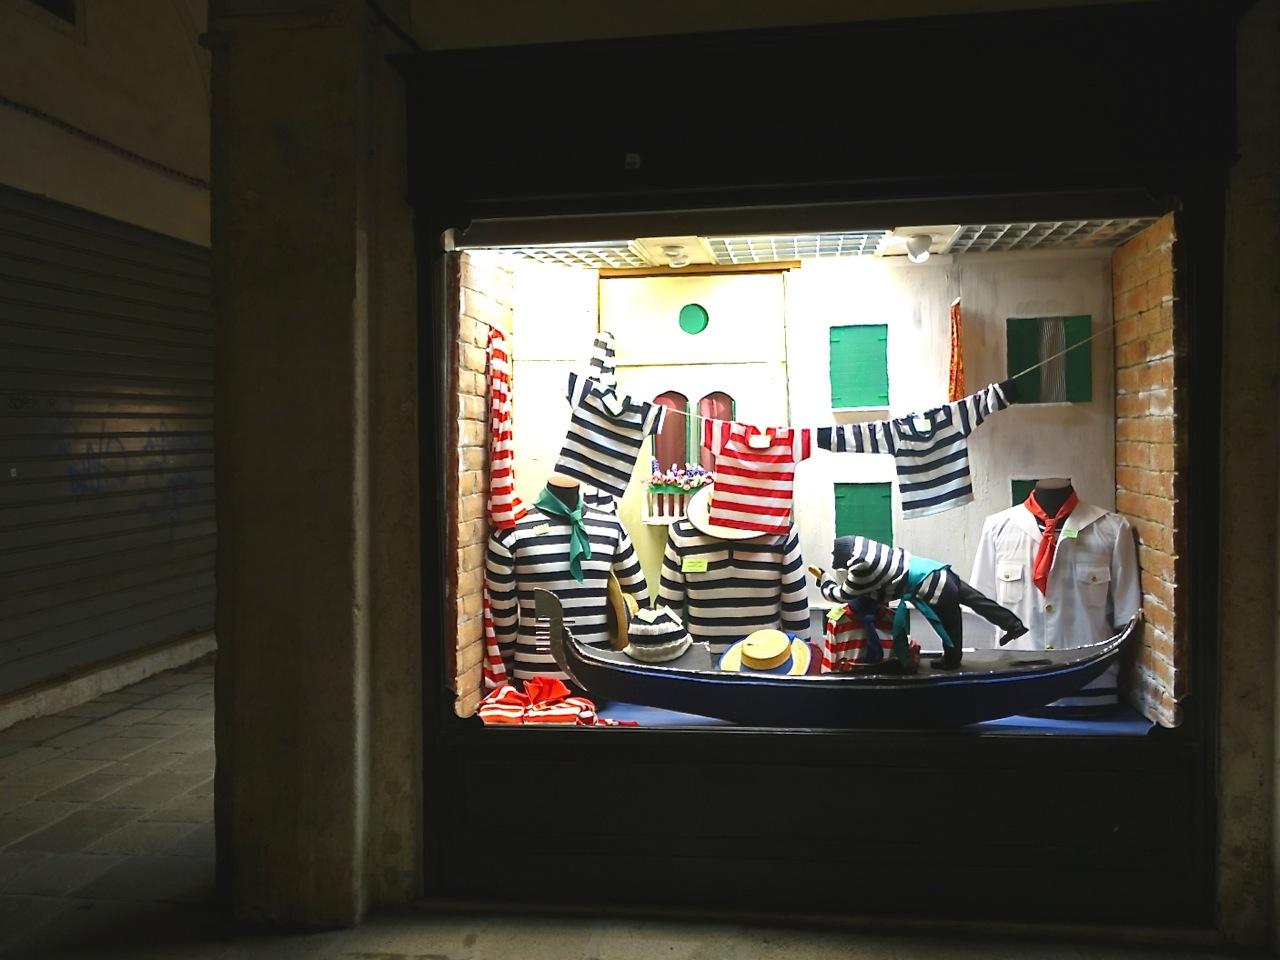 Dove comprare souvenir e regali a Venezia